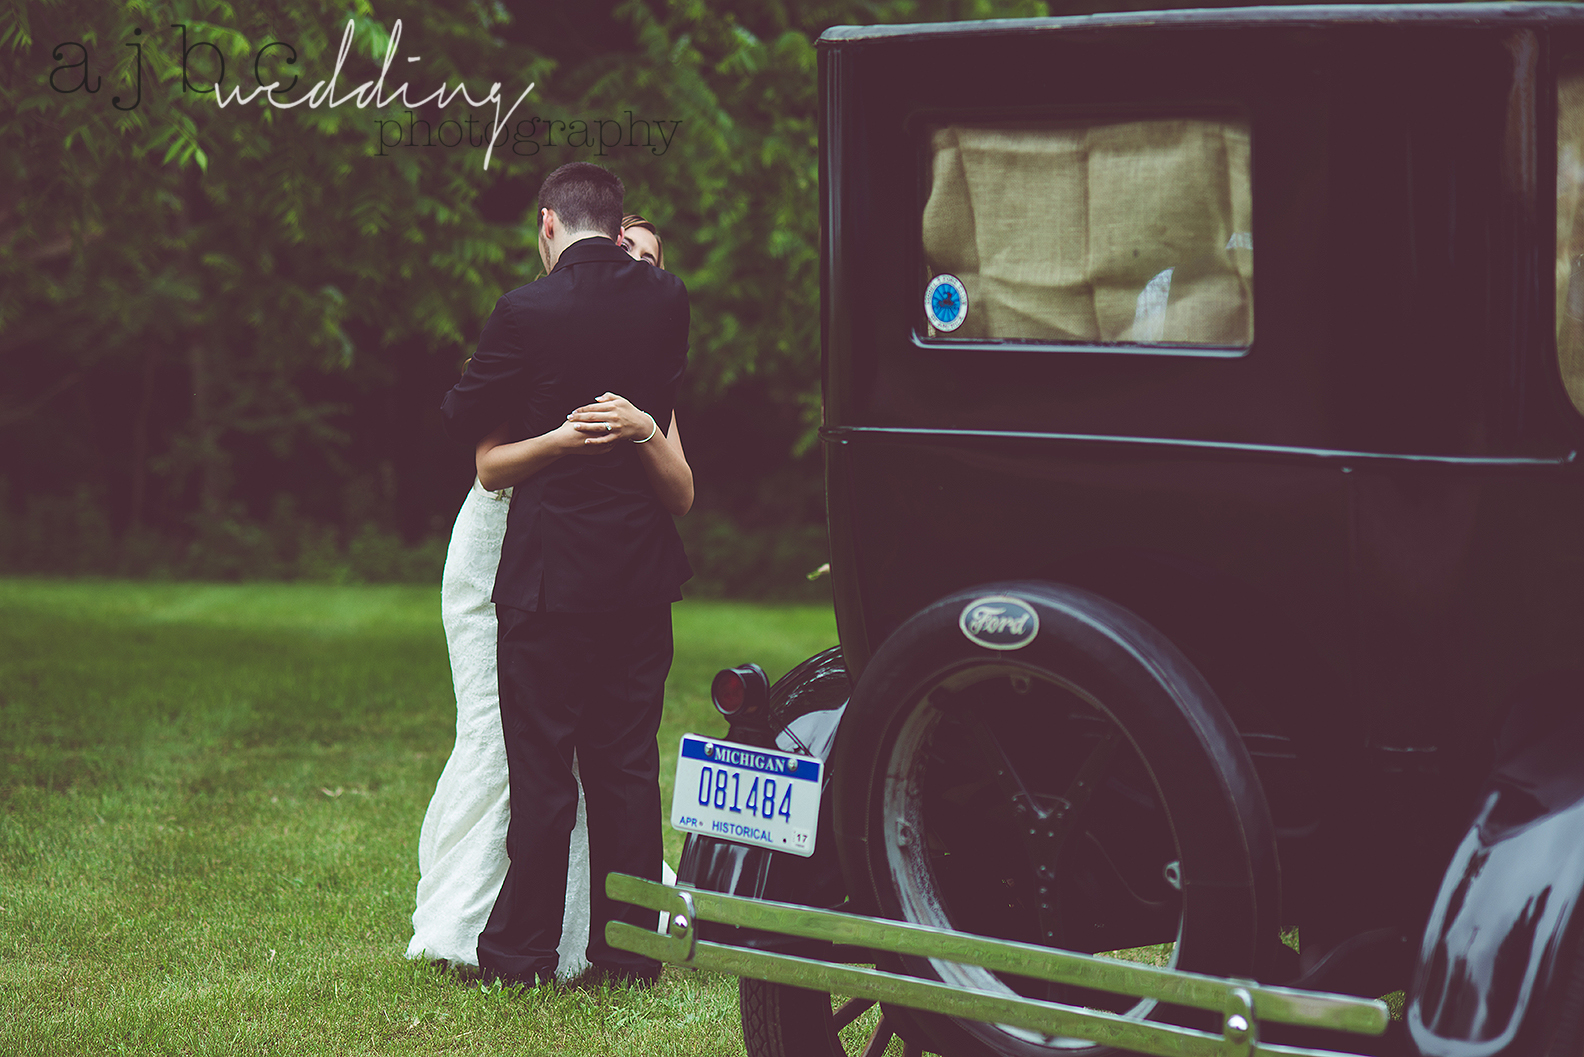 ajbcphotography-port-huron-michigan-wedding-photographer-outdoors-summer-wedding-country-wedding-wadhams-michigan-bride-vintage-wedding-bride-groom.jpg